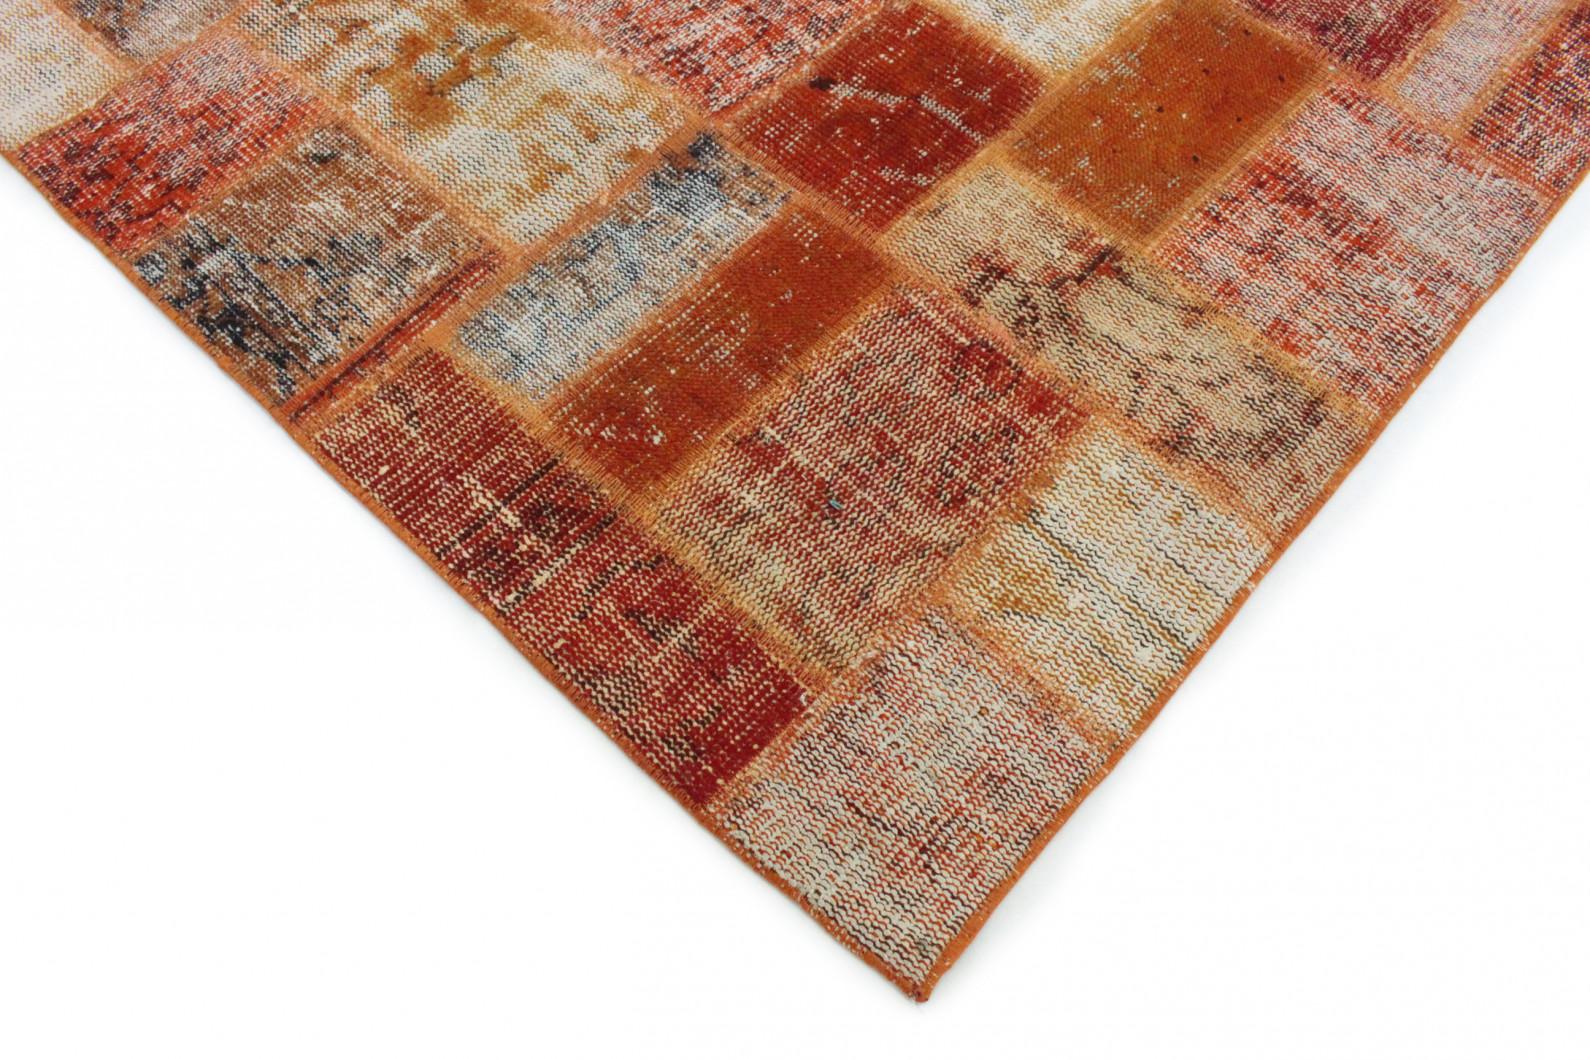 patchwork teppich orange in 300x260 1011 7900 bei. Black Bedroom Furniture Sets. Home Design Ideas